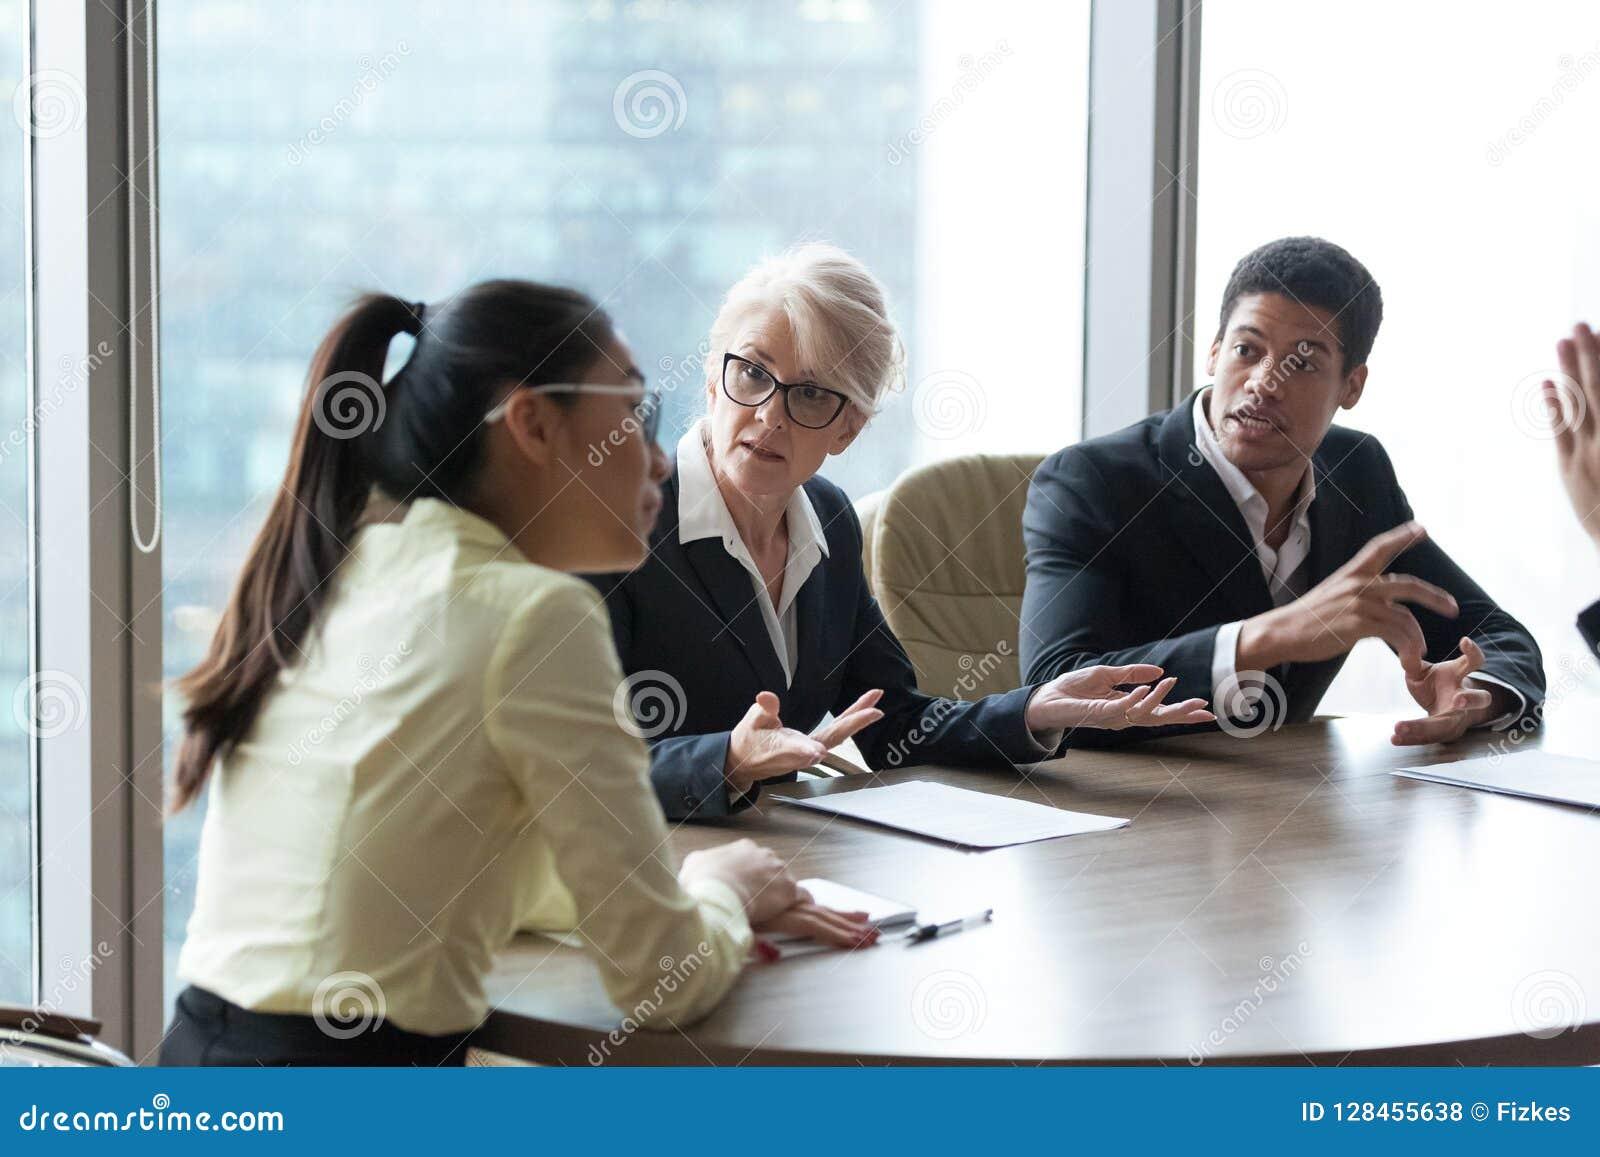 Спор работников обвиняя коллеги во время встречи компании